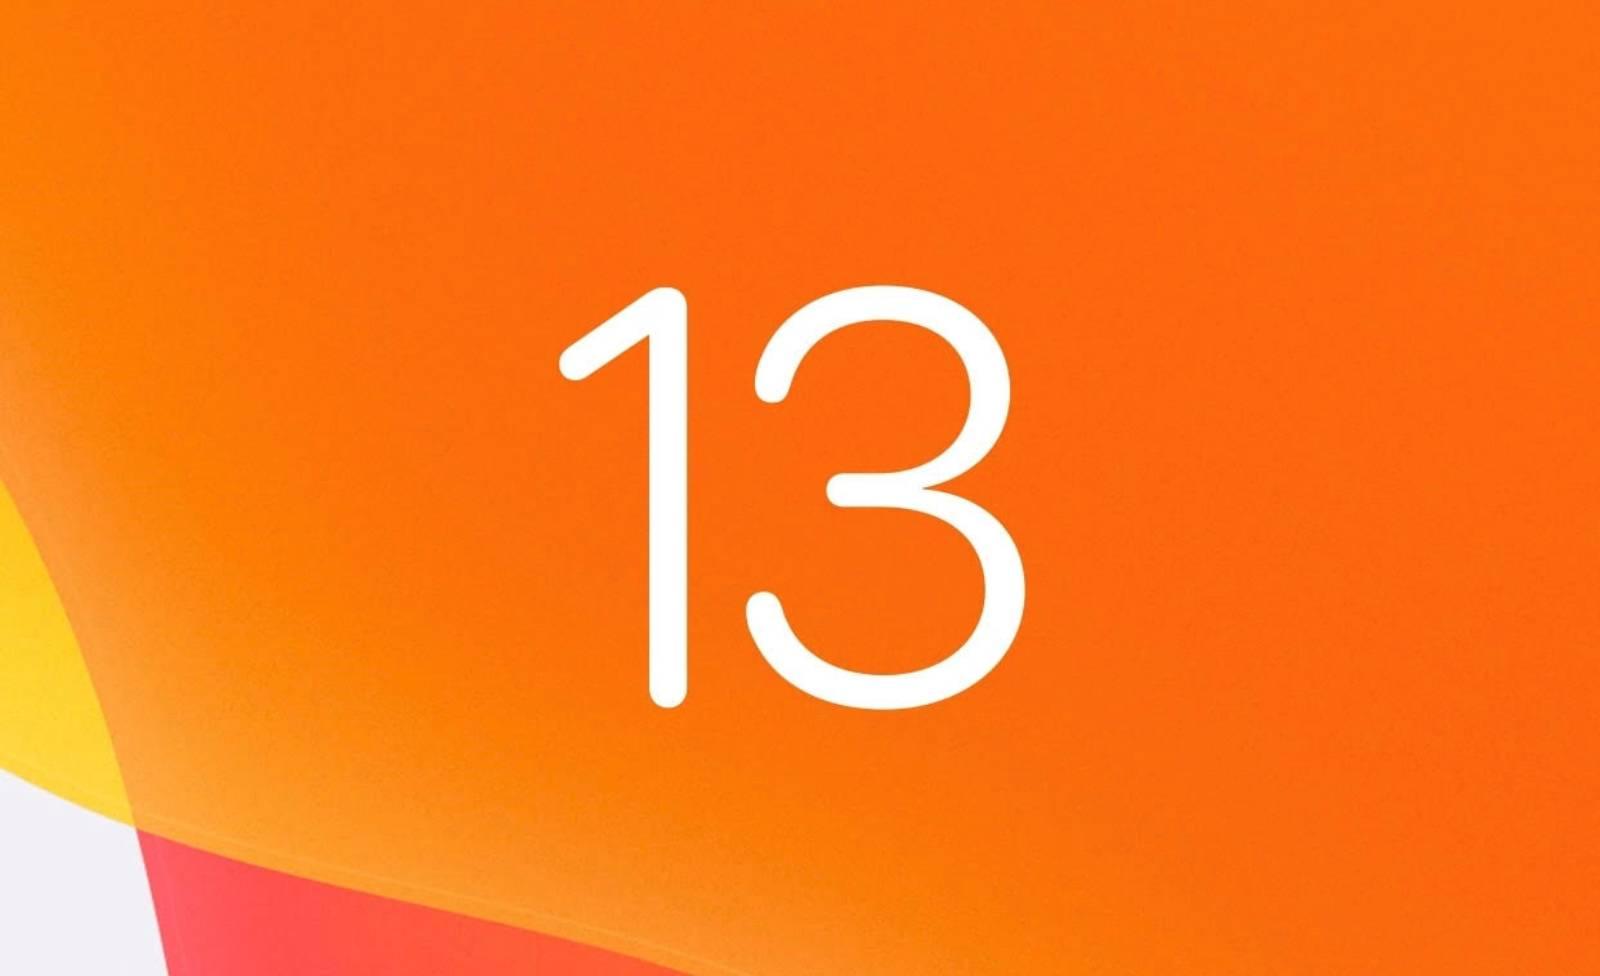 ios 13 apple lansare probleme